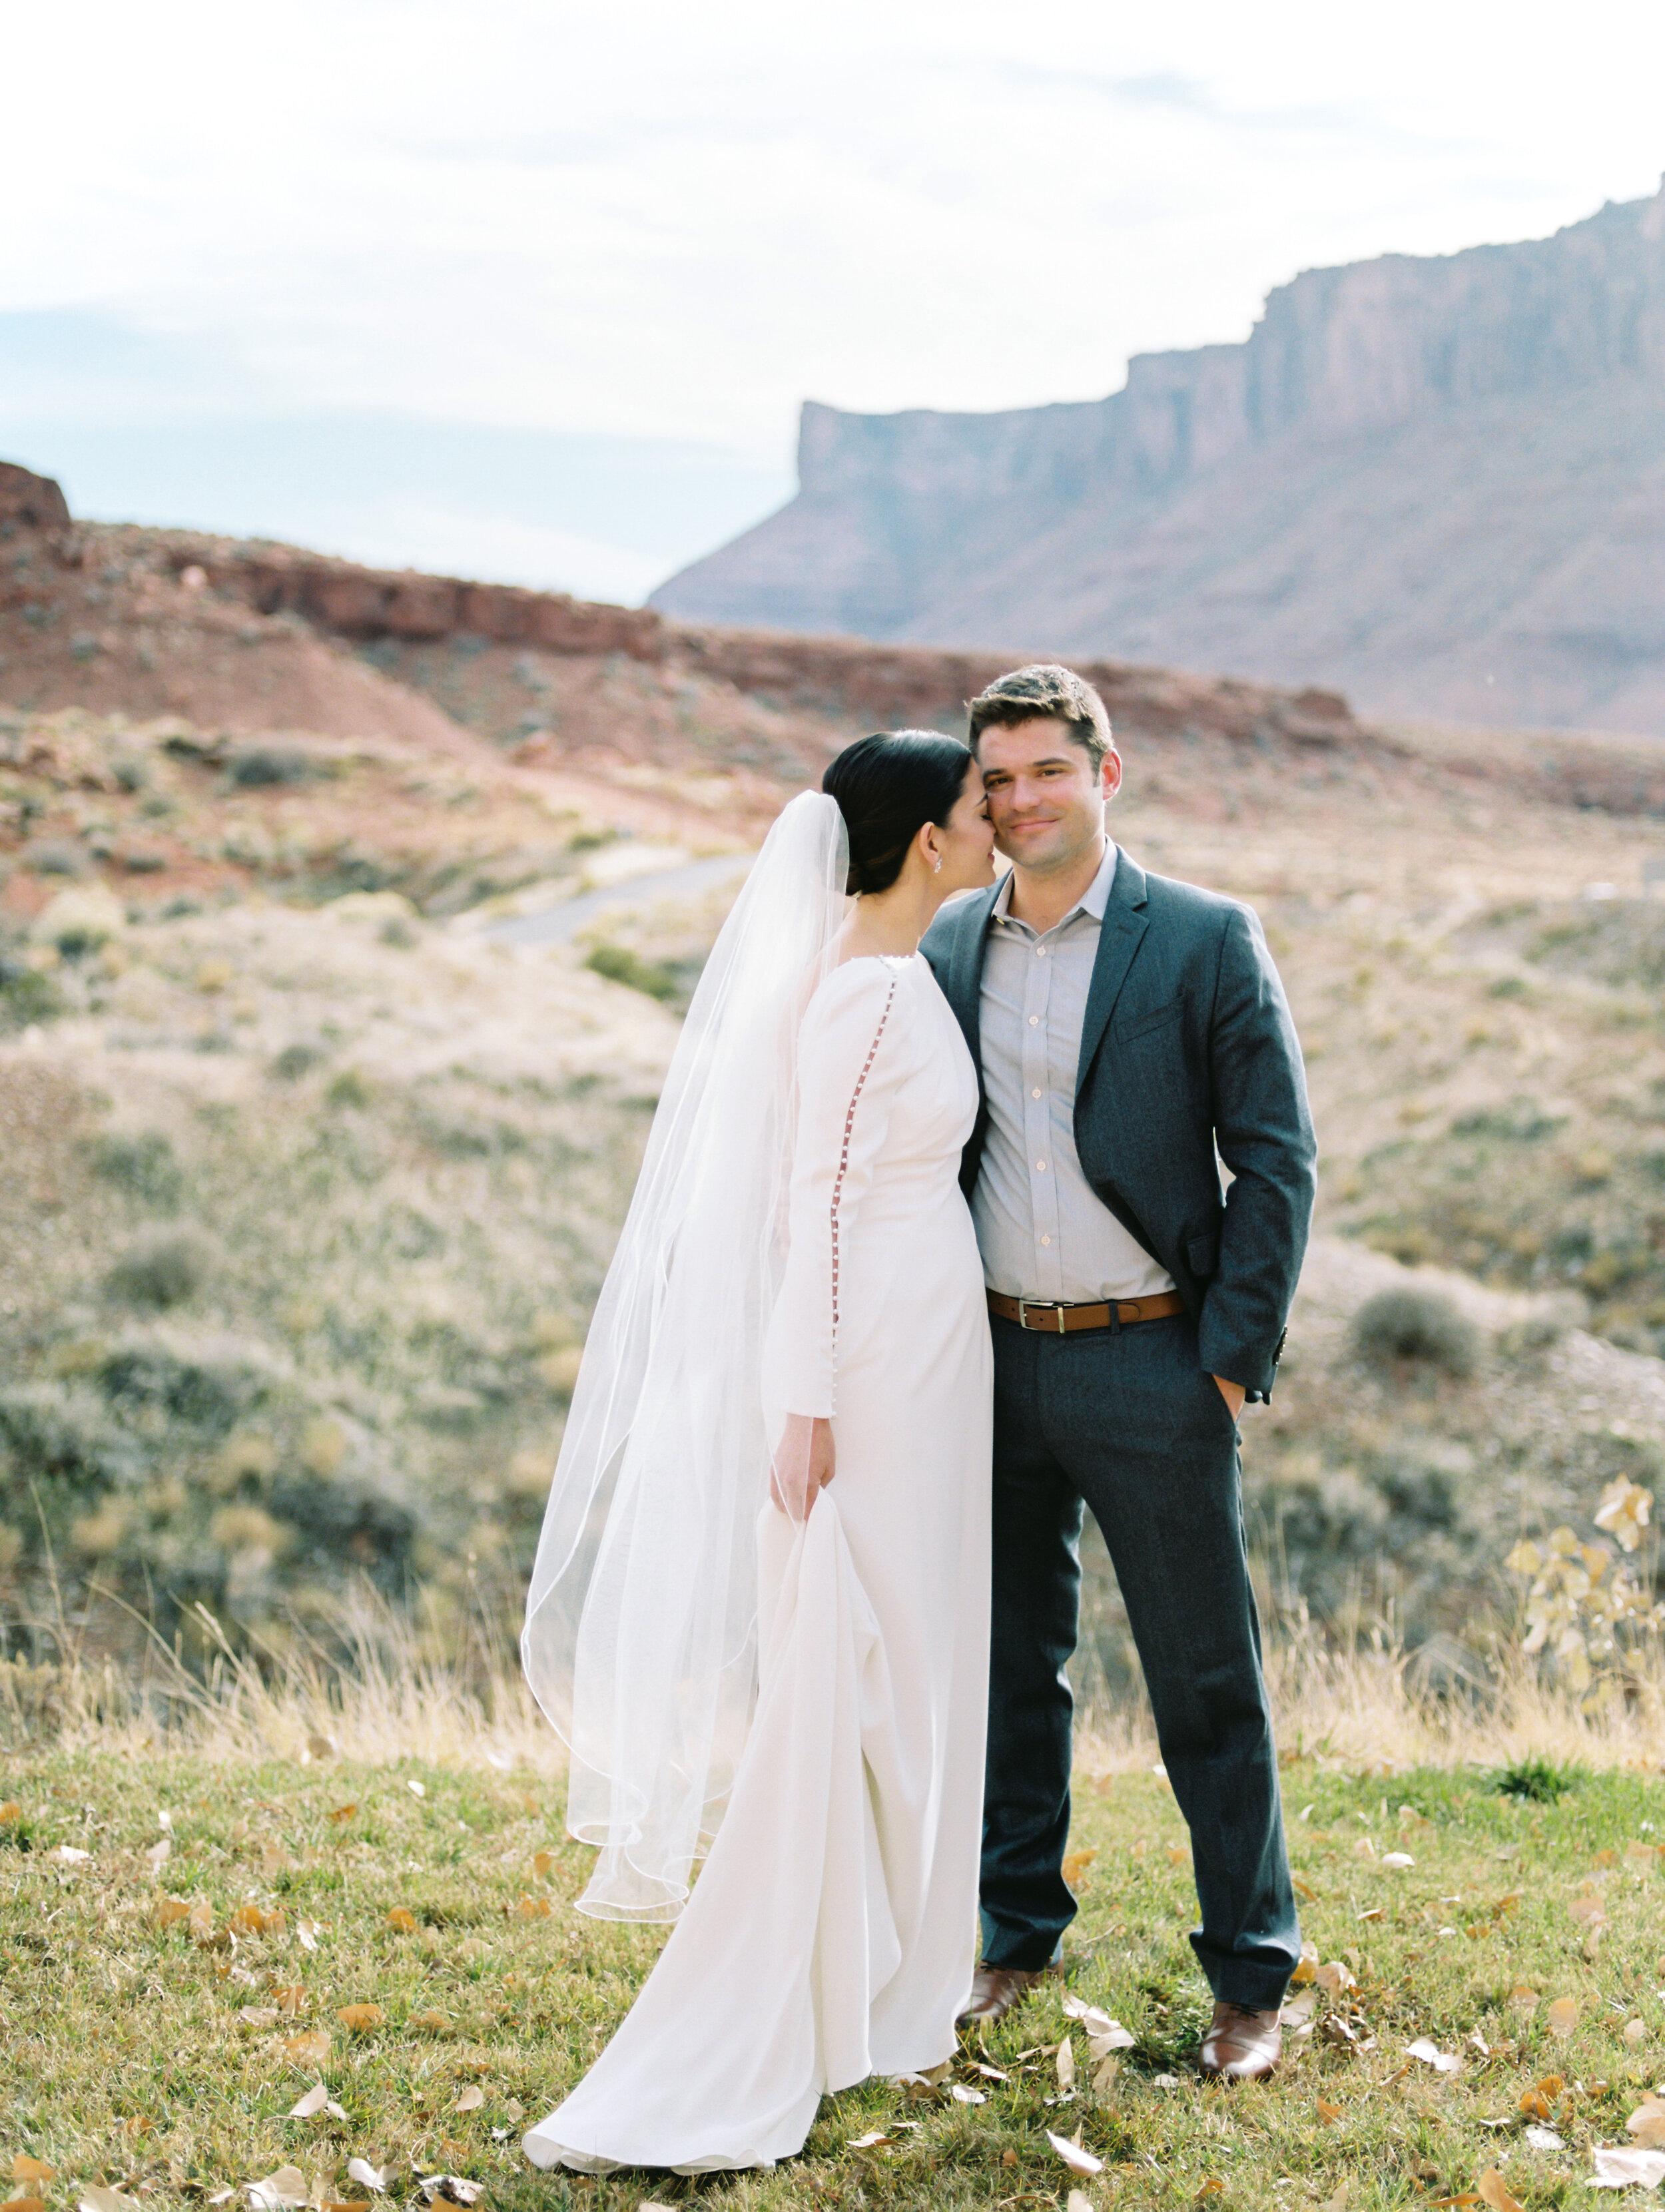 Victoria and Zach Sorrel River Ranch Wedding 049.jpg